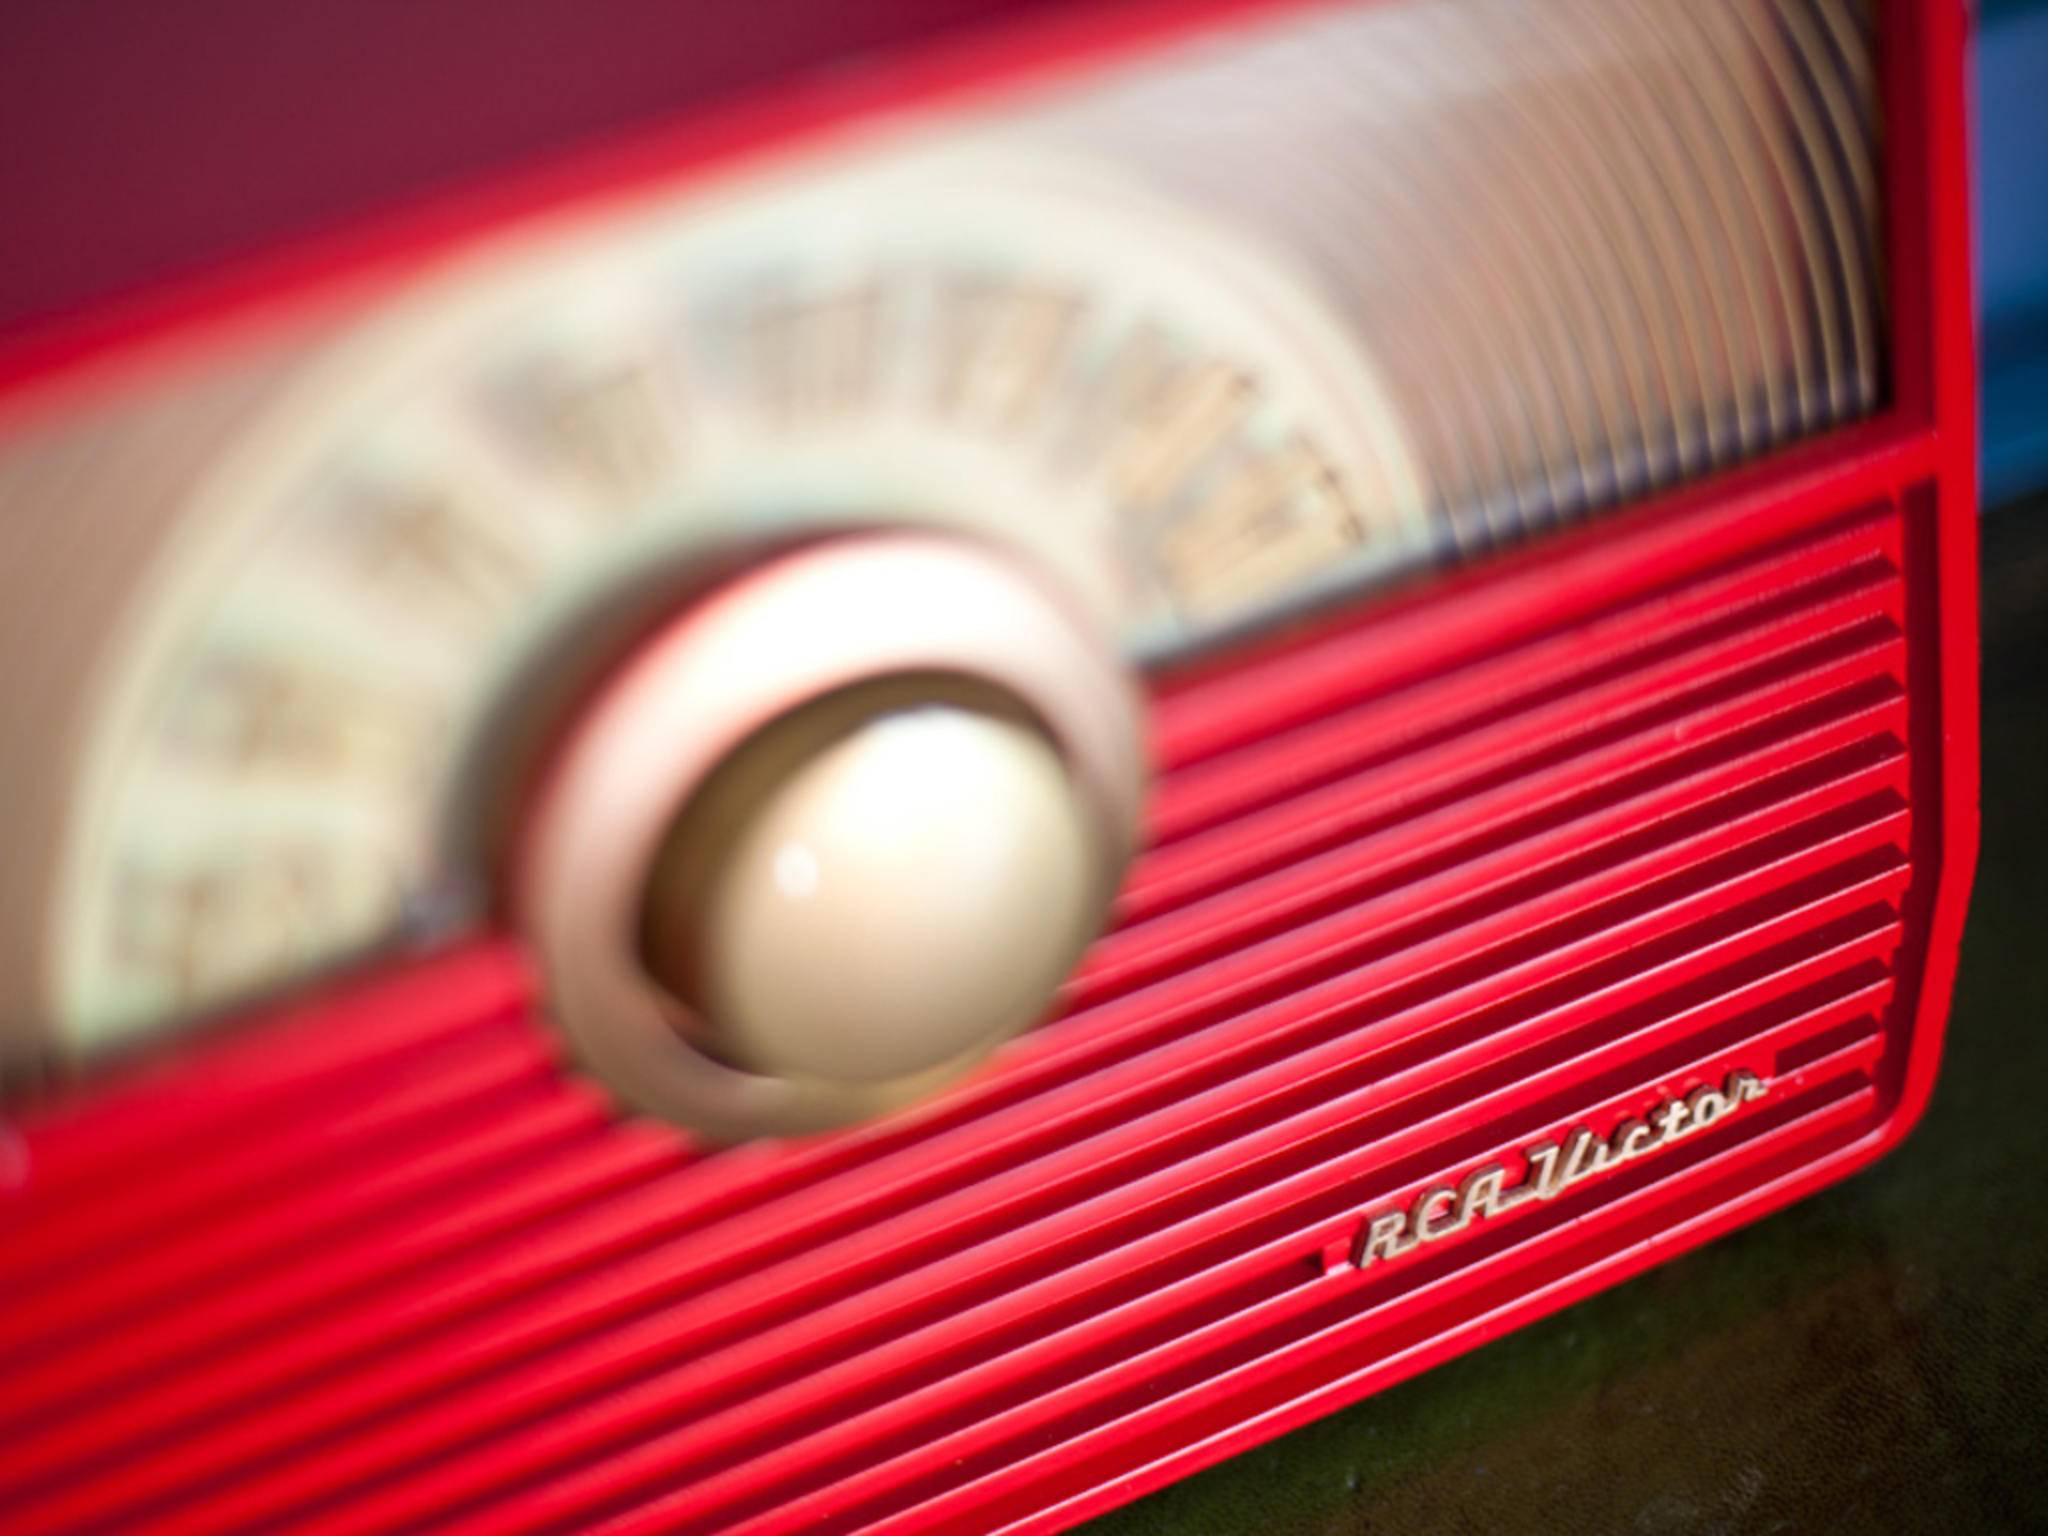 Die neue App SwipeRadio bringt lokale Radiosender auf das iPhone.